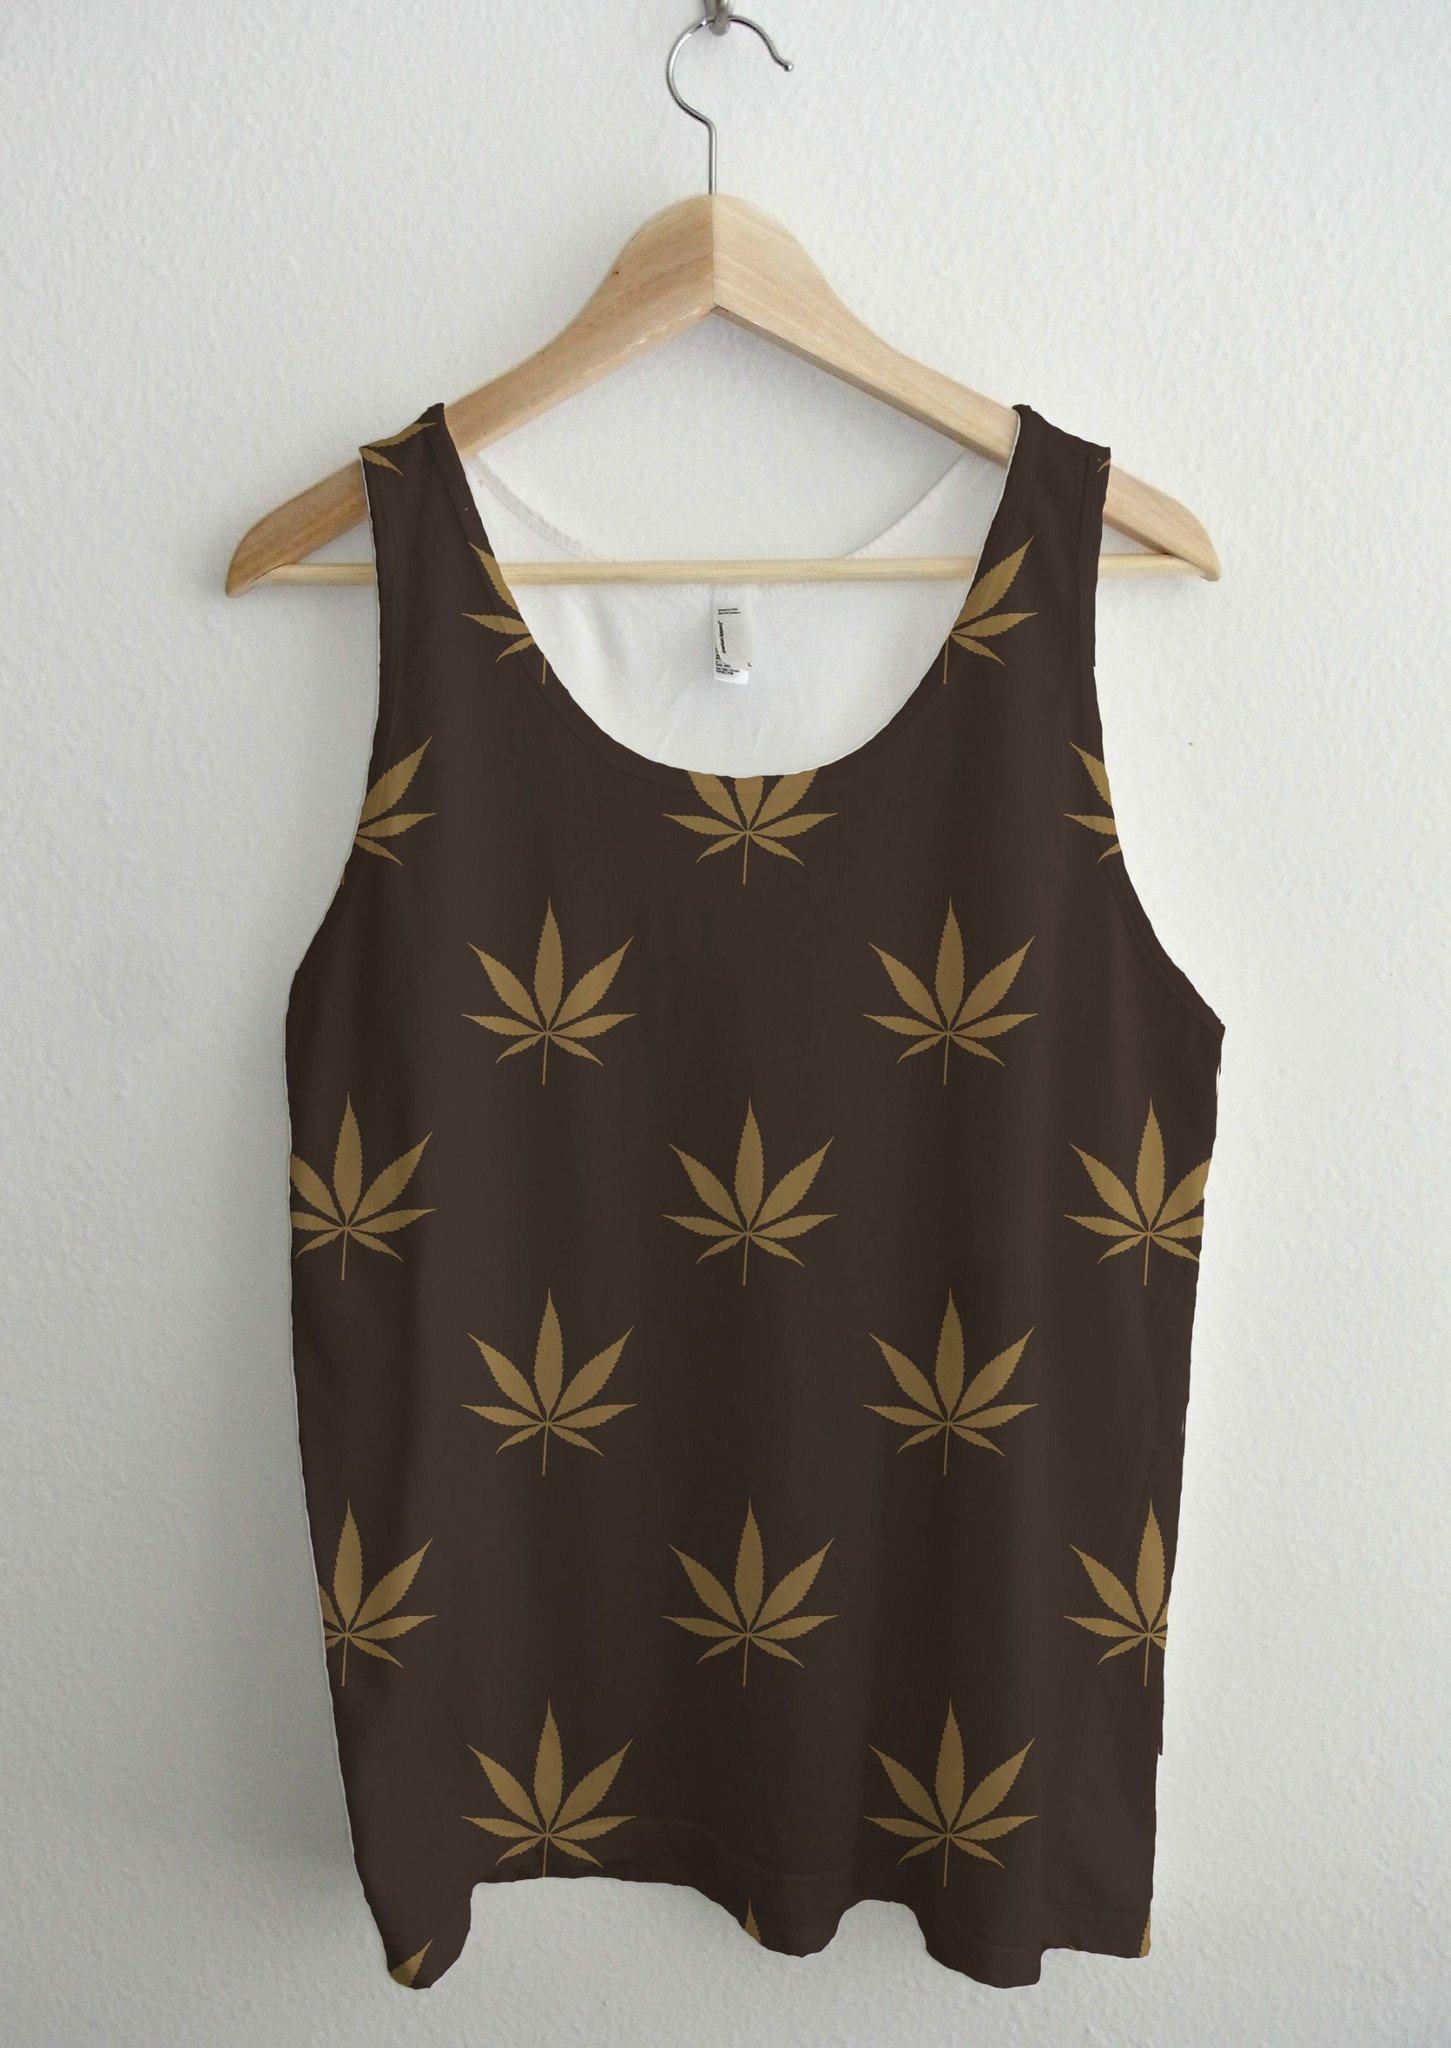 Ava Wilde LV Brown Gold Cannabis Pattern Full Print Unisex Tank Top